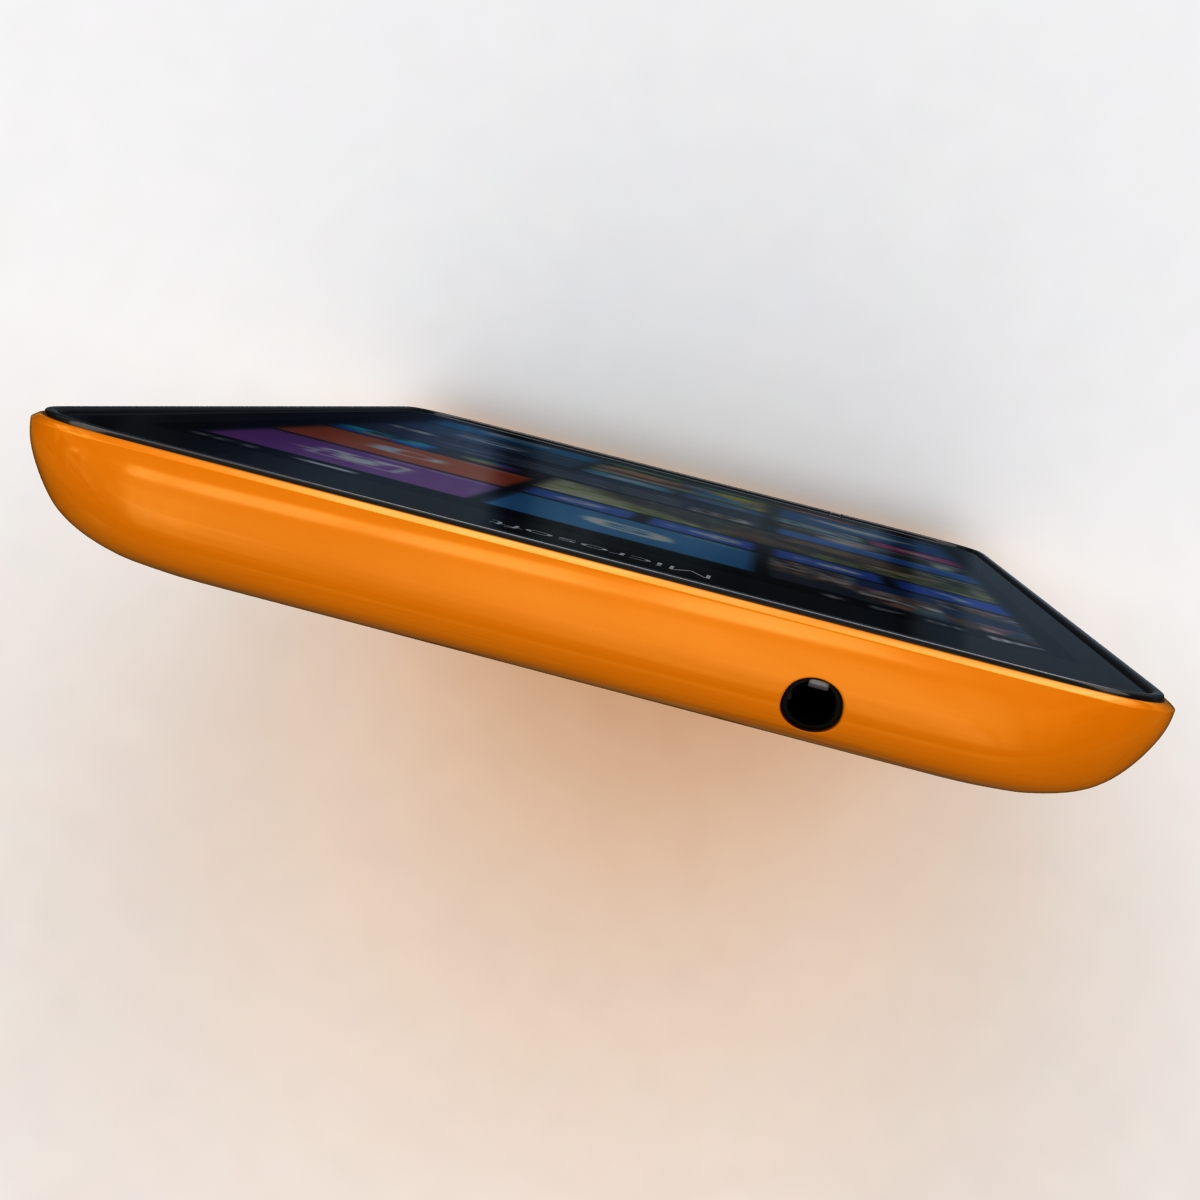 microsoft lumia 535 and dual sim orange 3d model 3ds max fbx c4d obj 204122